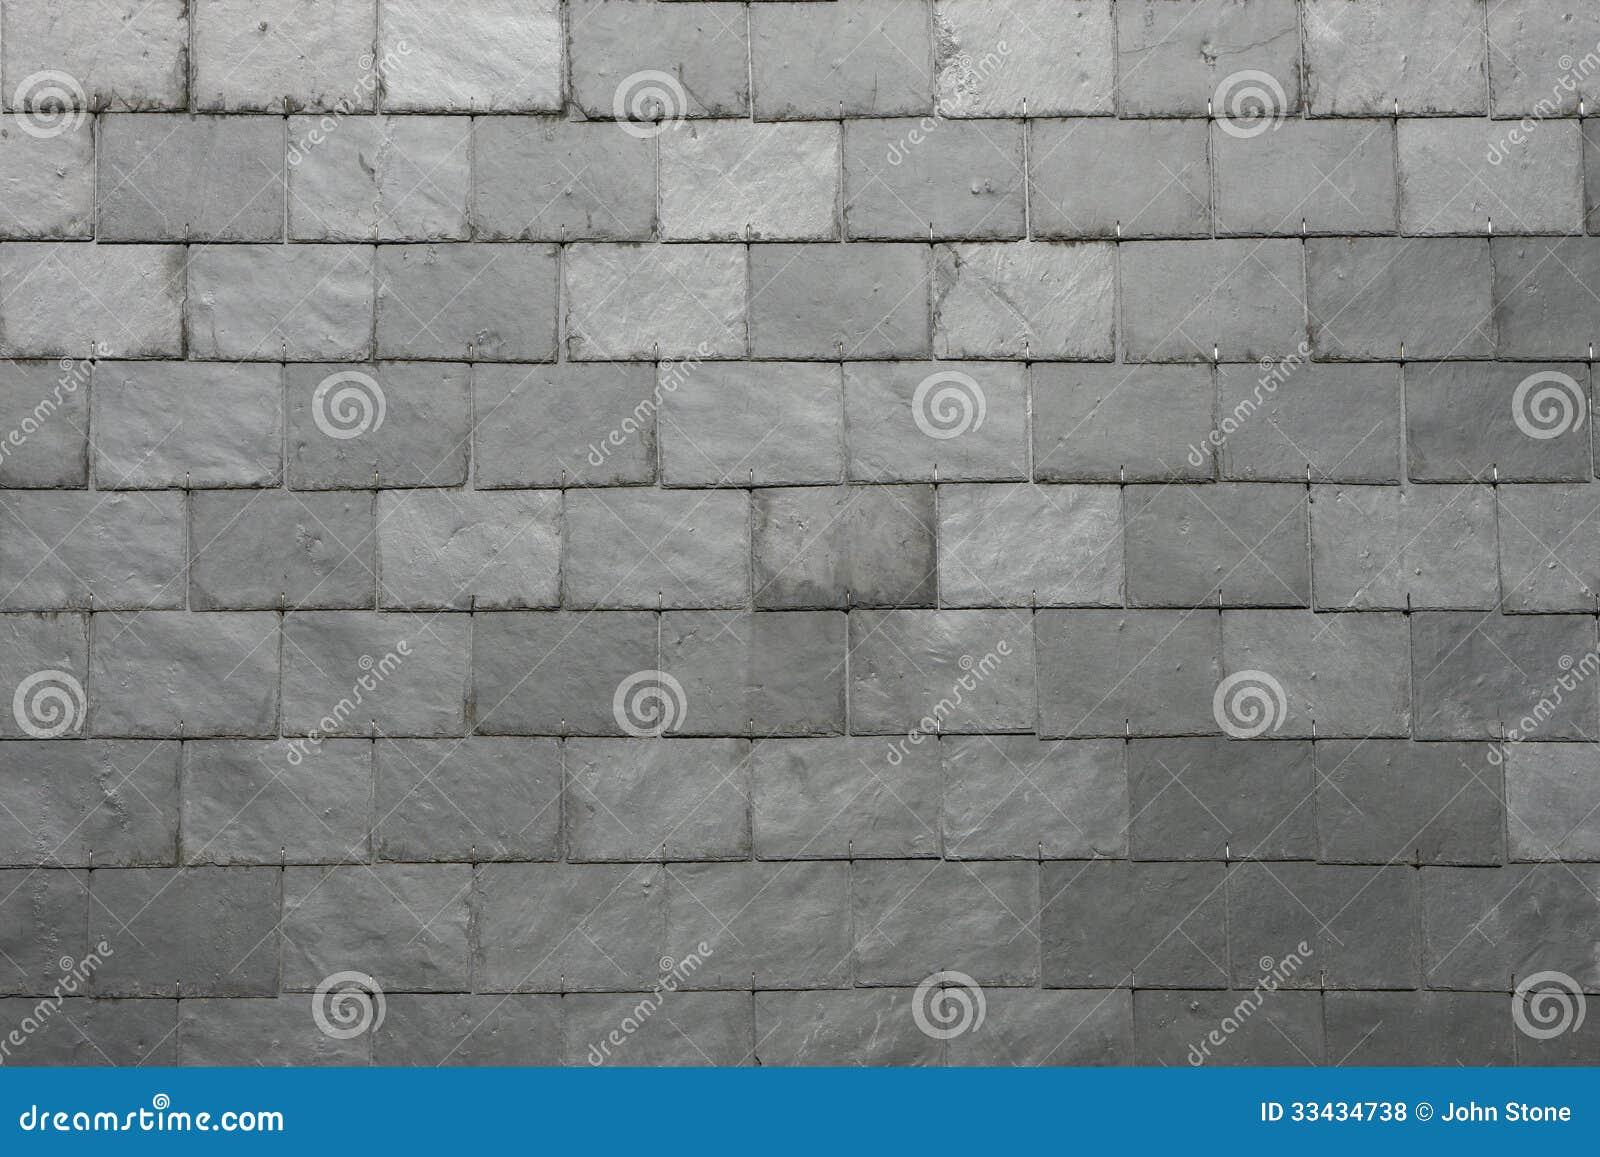 Slate Tile Background Stock Photo Image Of Slate Texture